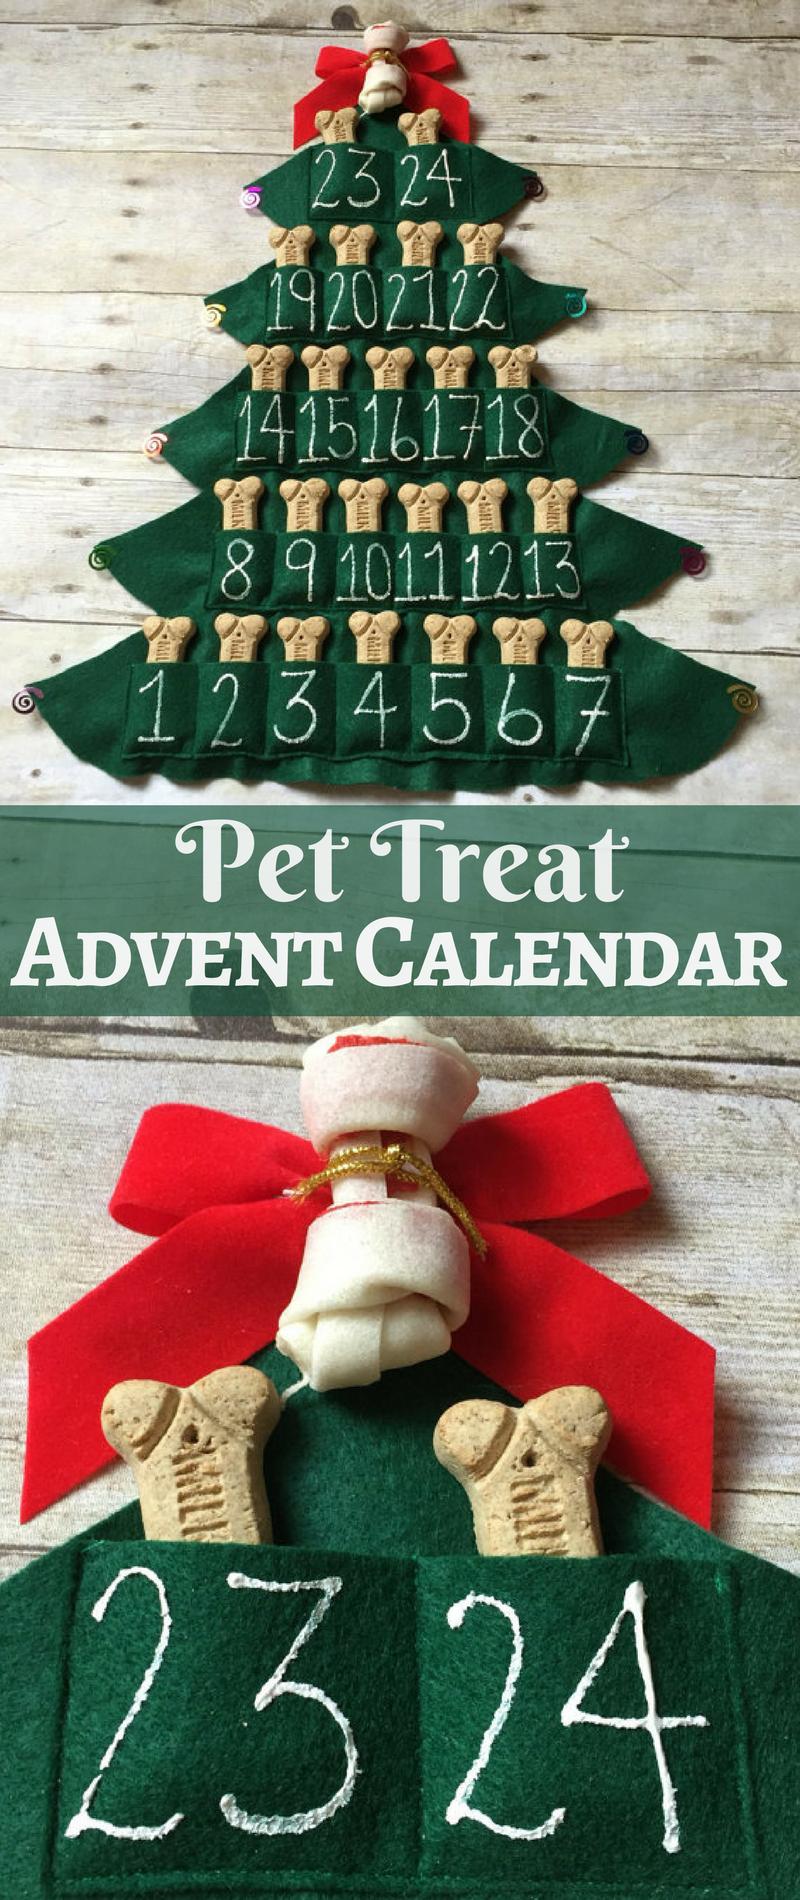 Two Pet Treat Advent Calendars NO BONES, Felt Christmas